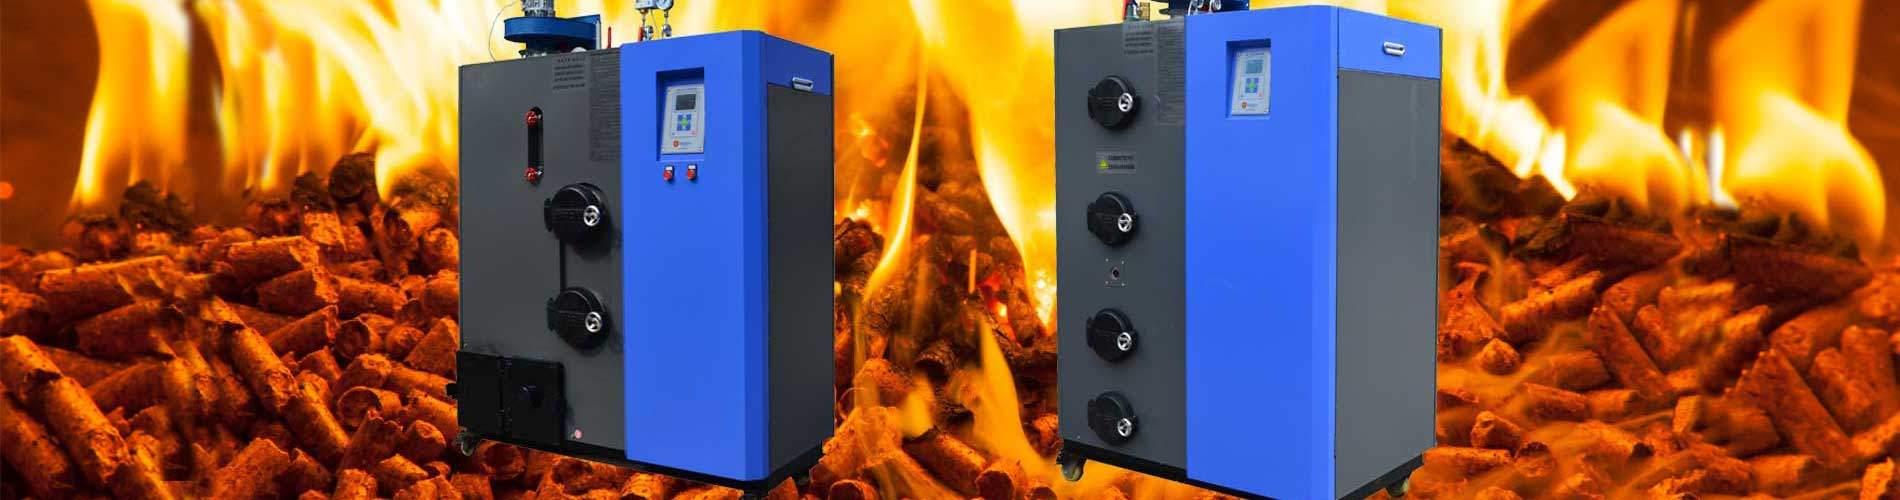 50kg-per-hour-wood-pellet-steam-generators